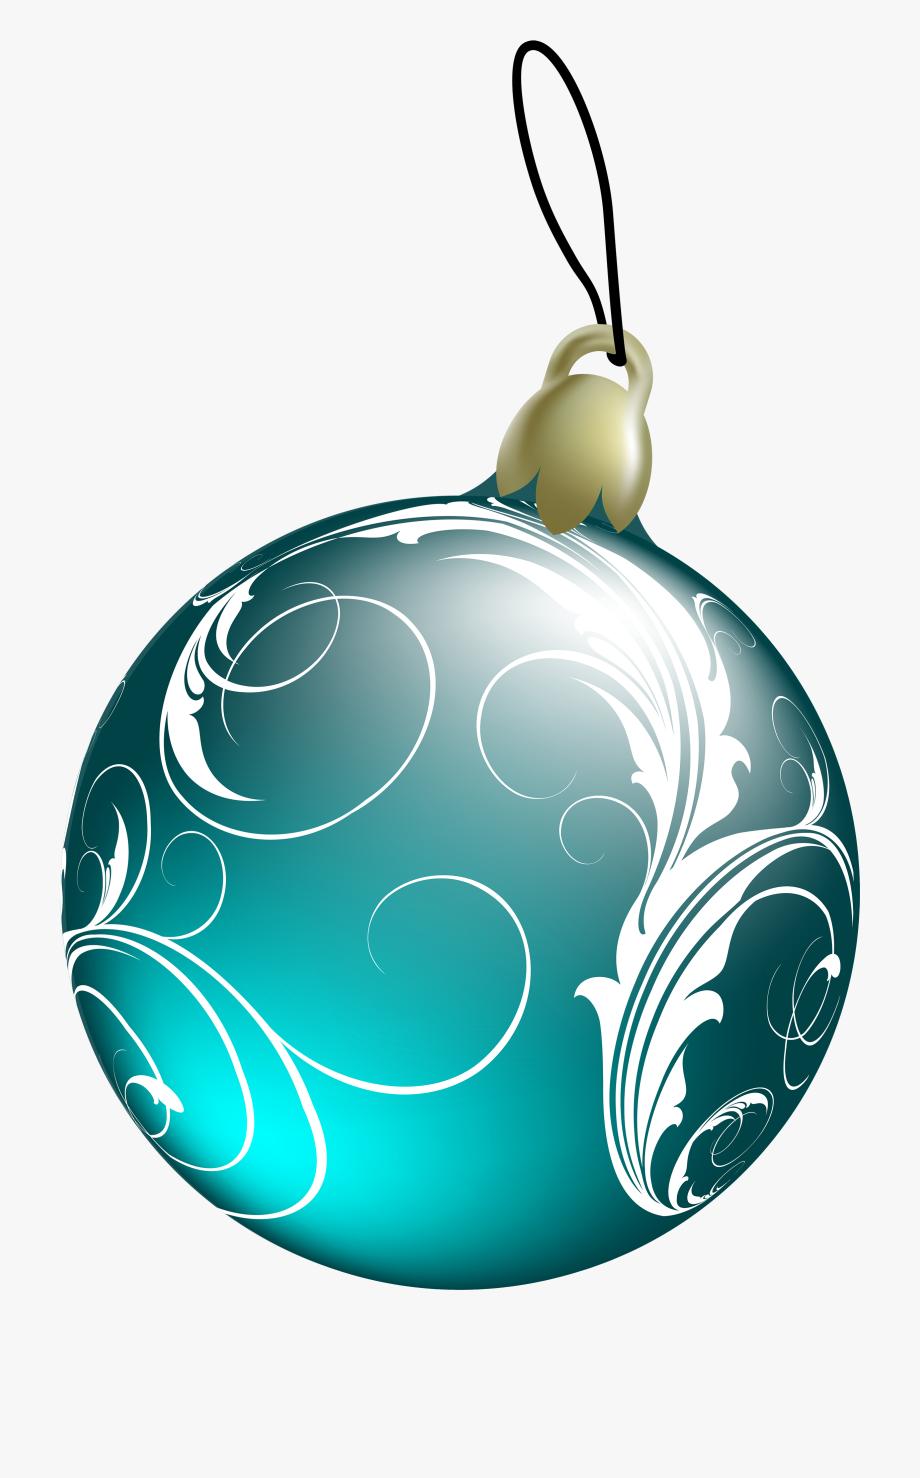 Clipart Of Ornaments.